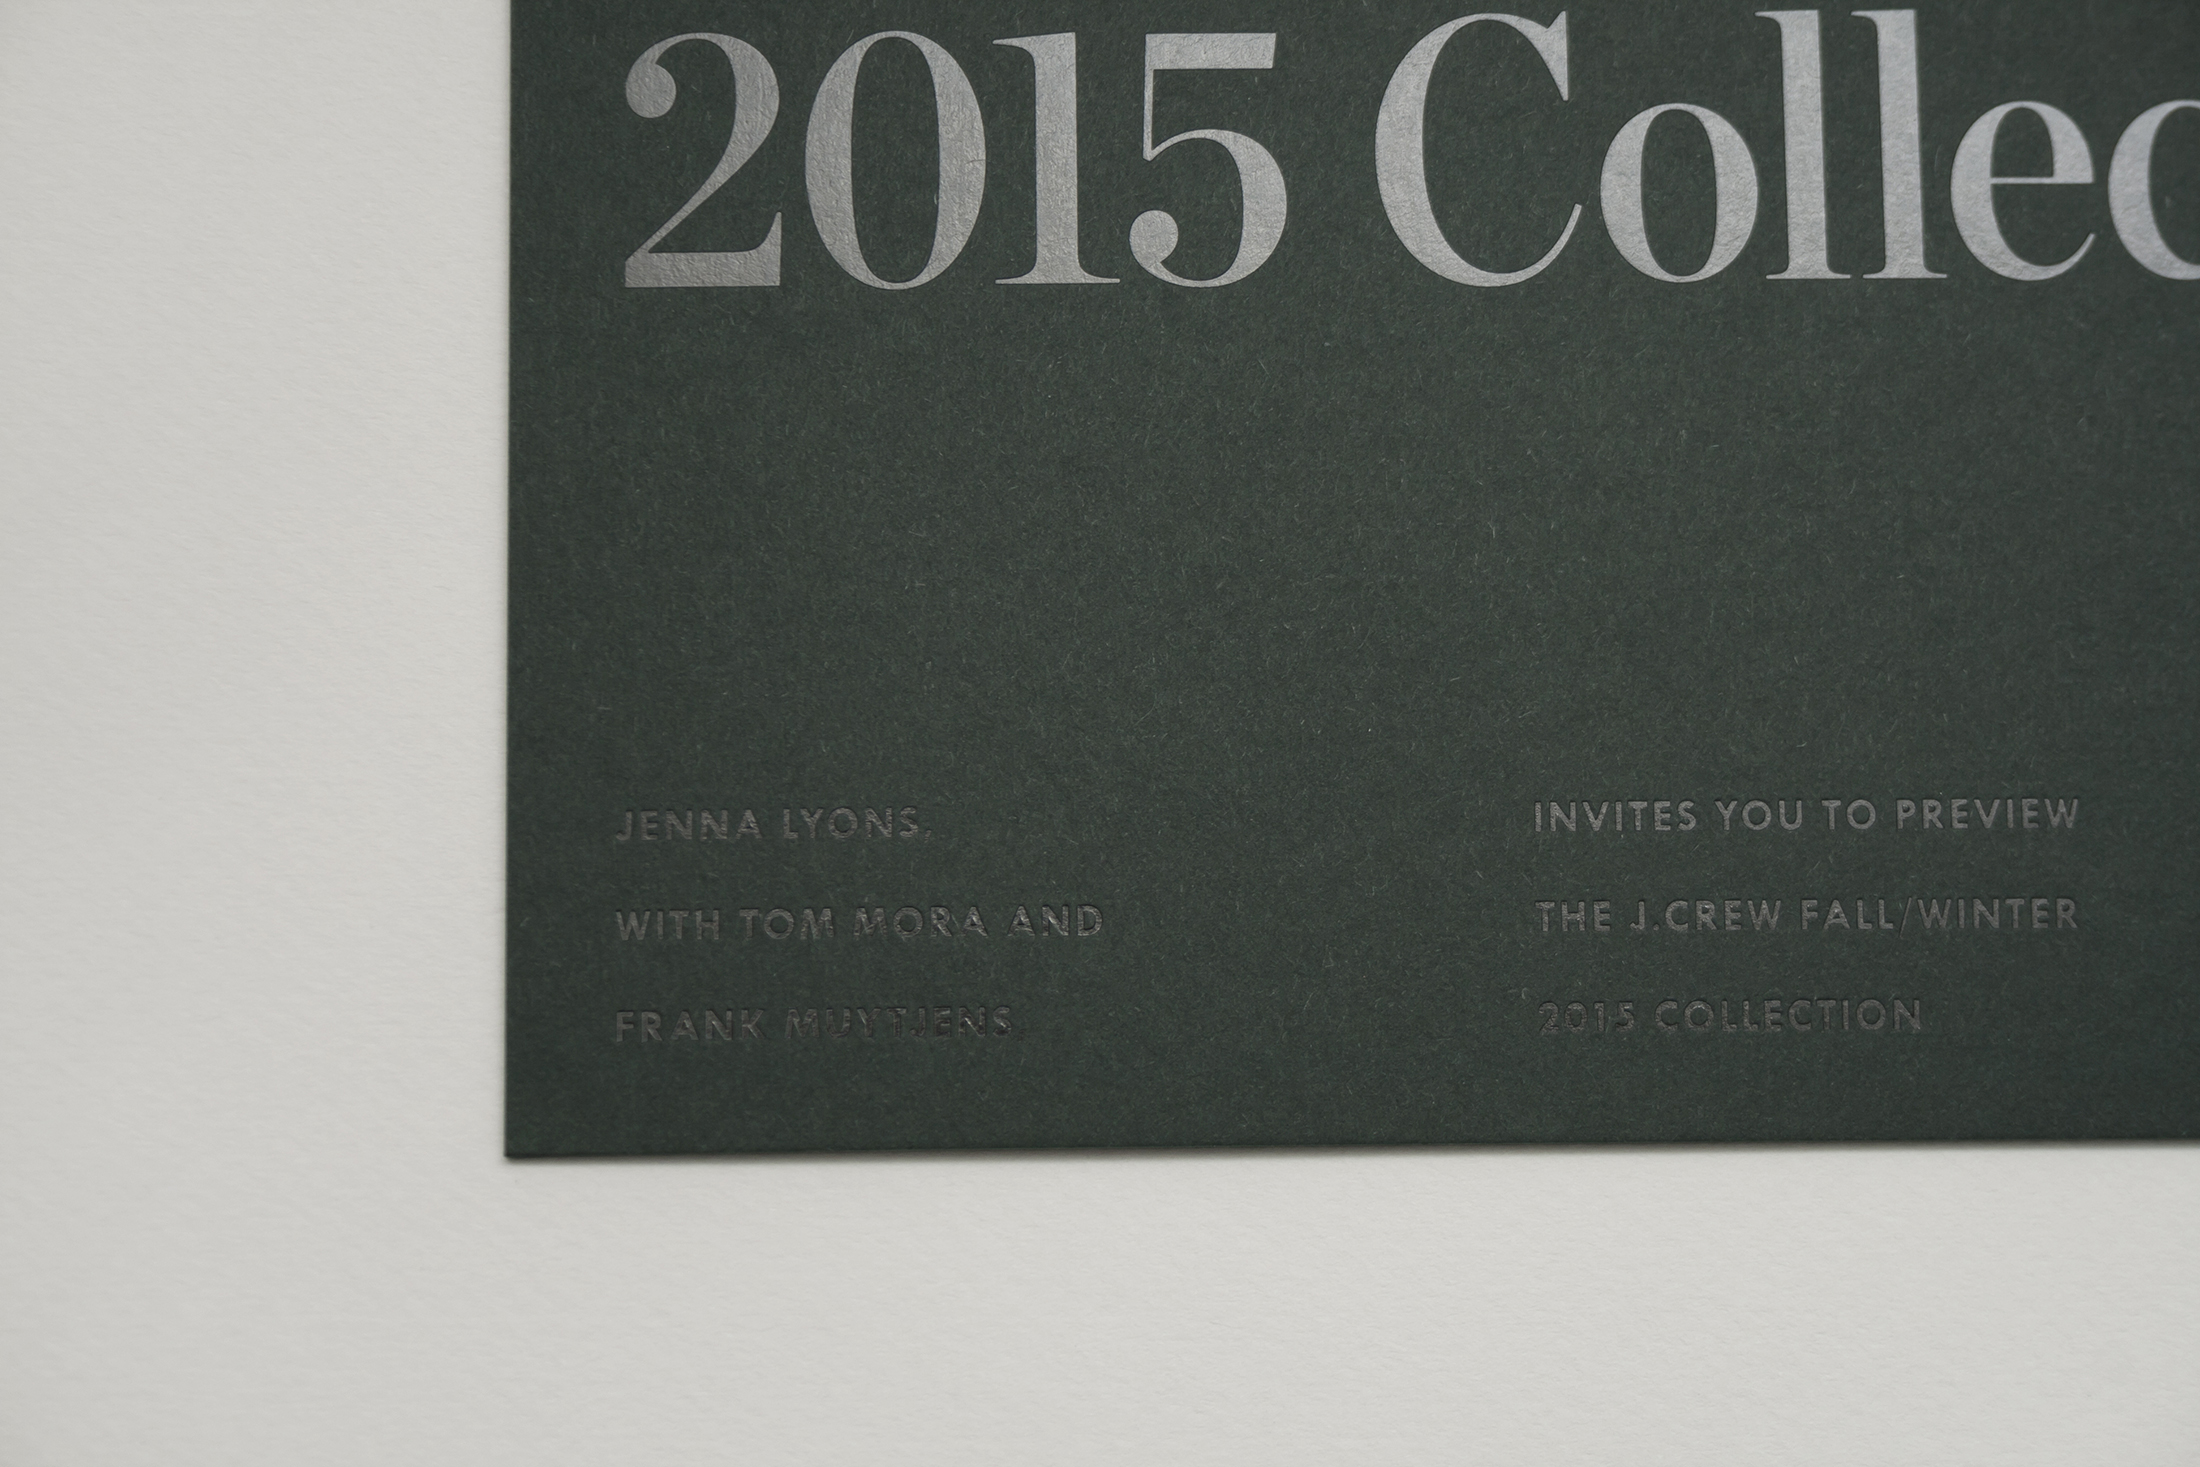 J.Crew Fall/Winter 2015 Invitation